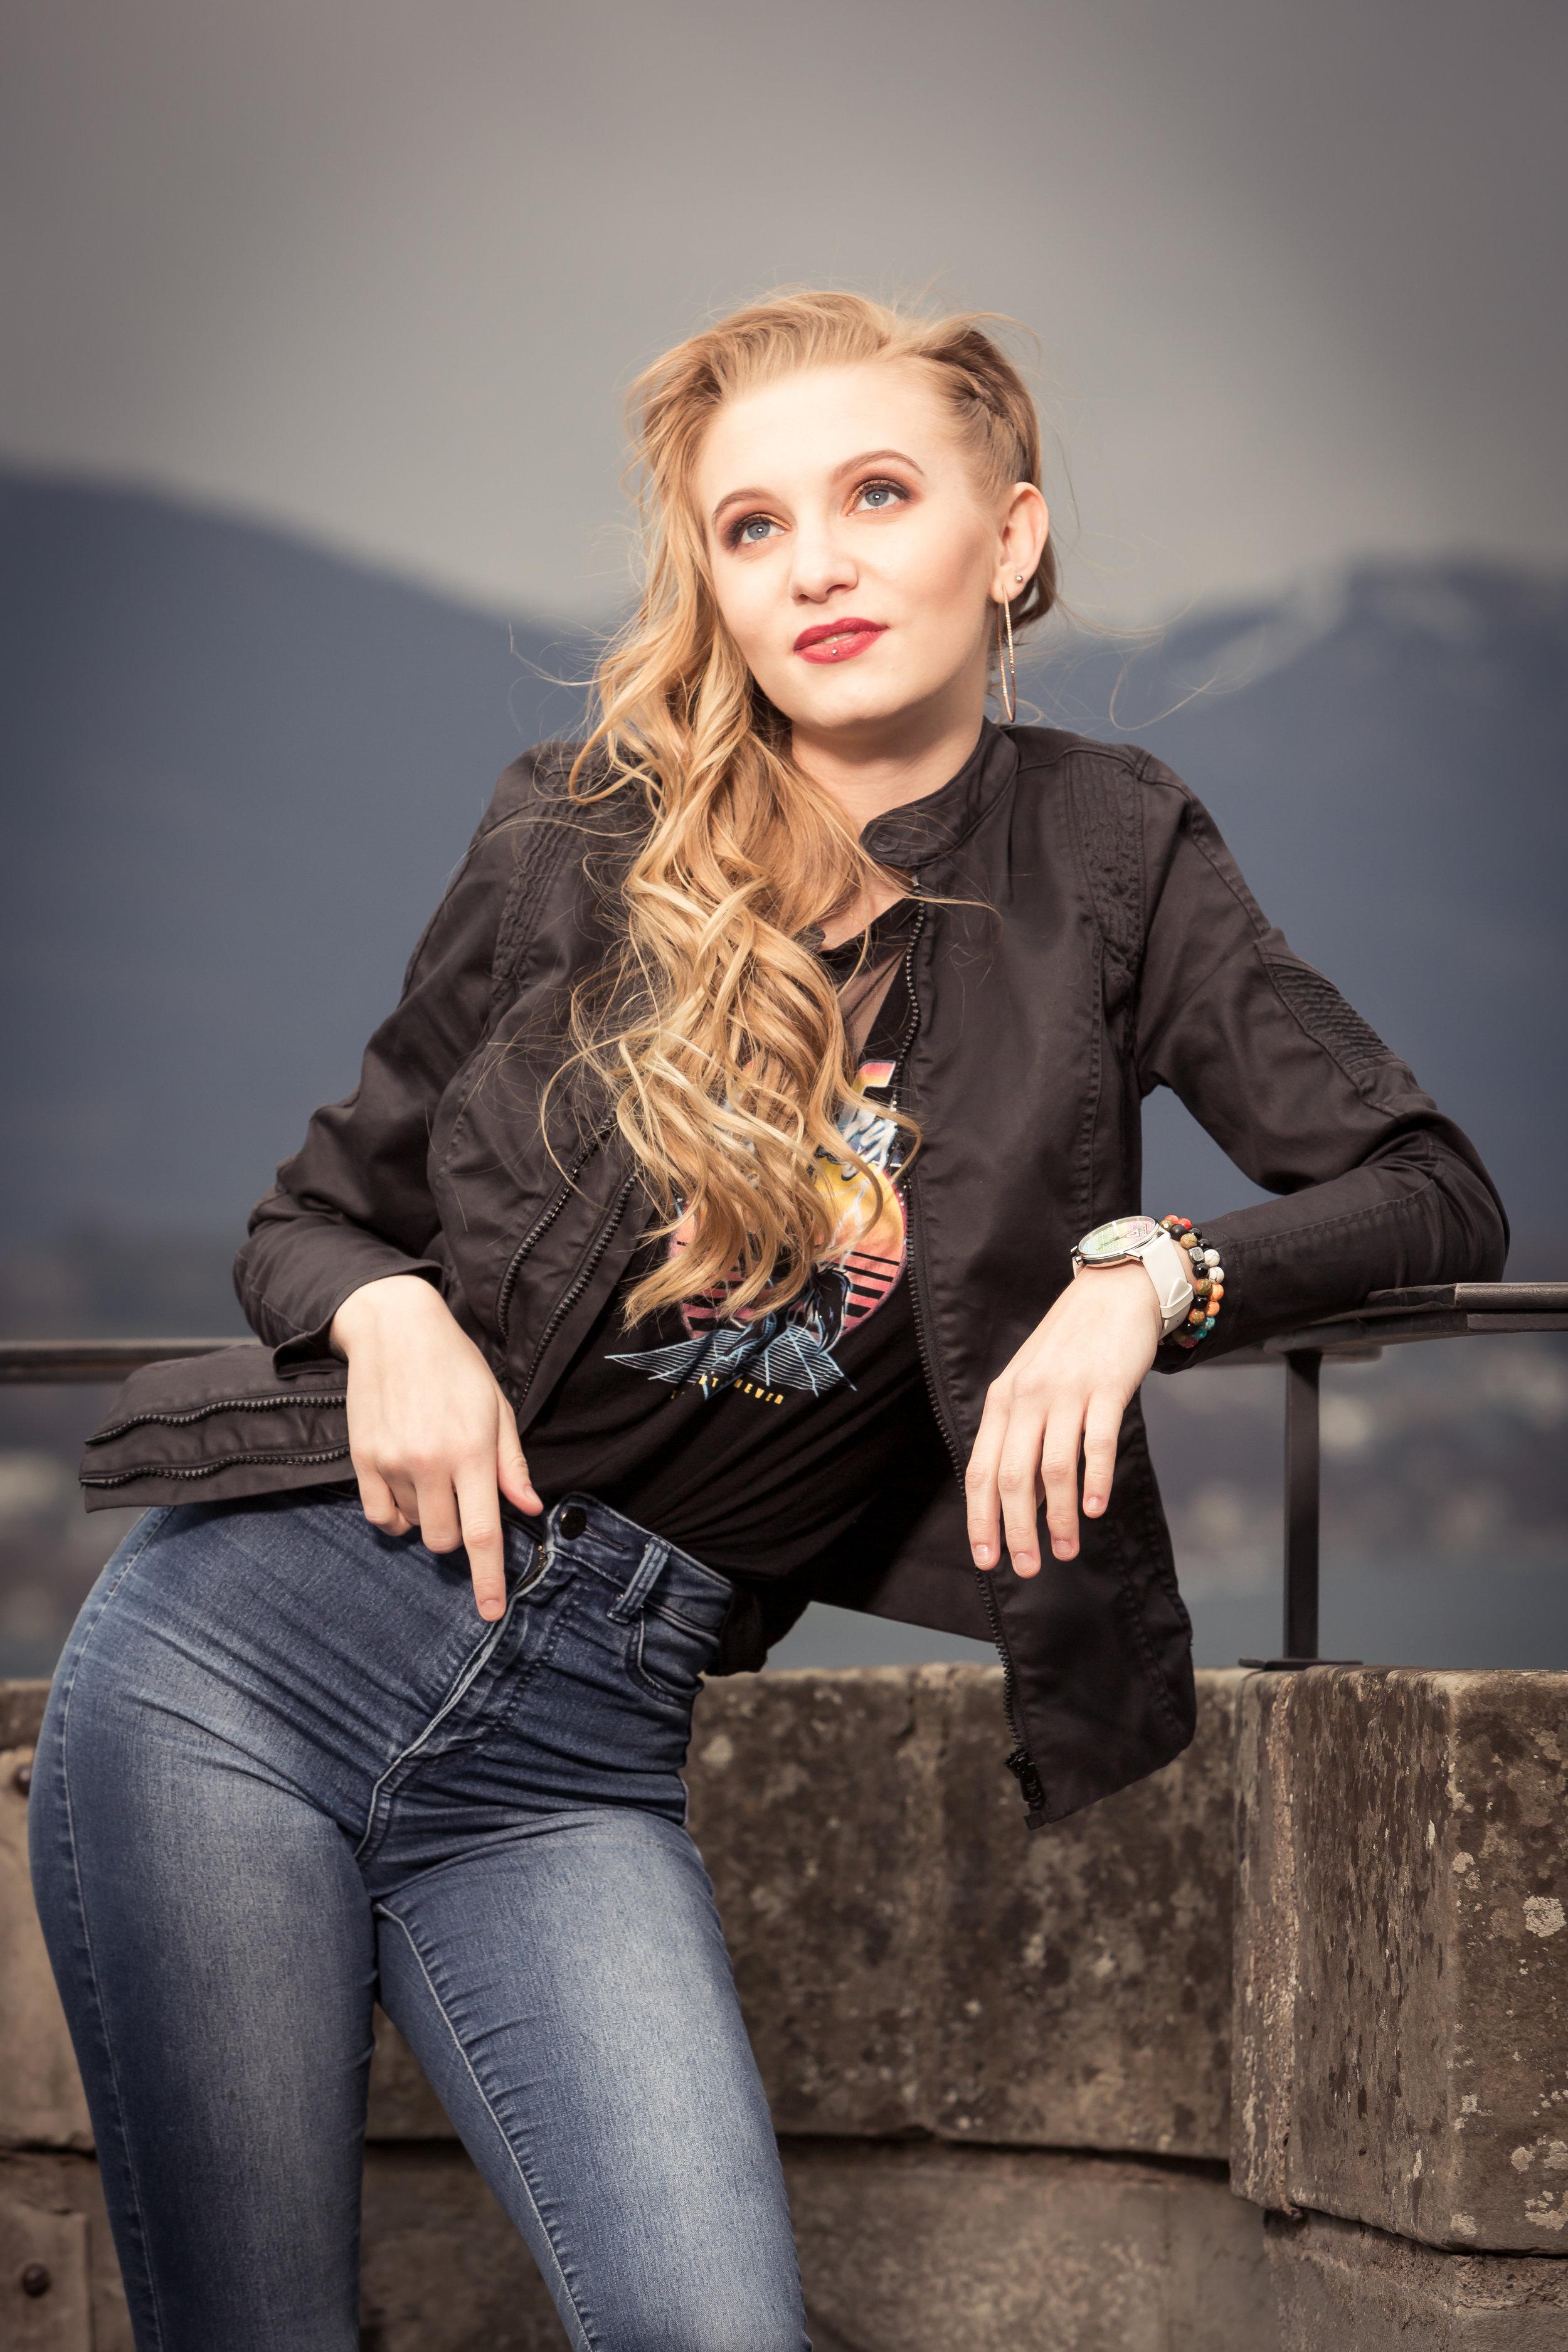 Miss Zentralschweiz, marcoherzig.com-8.jpg